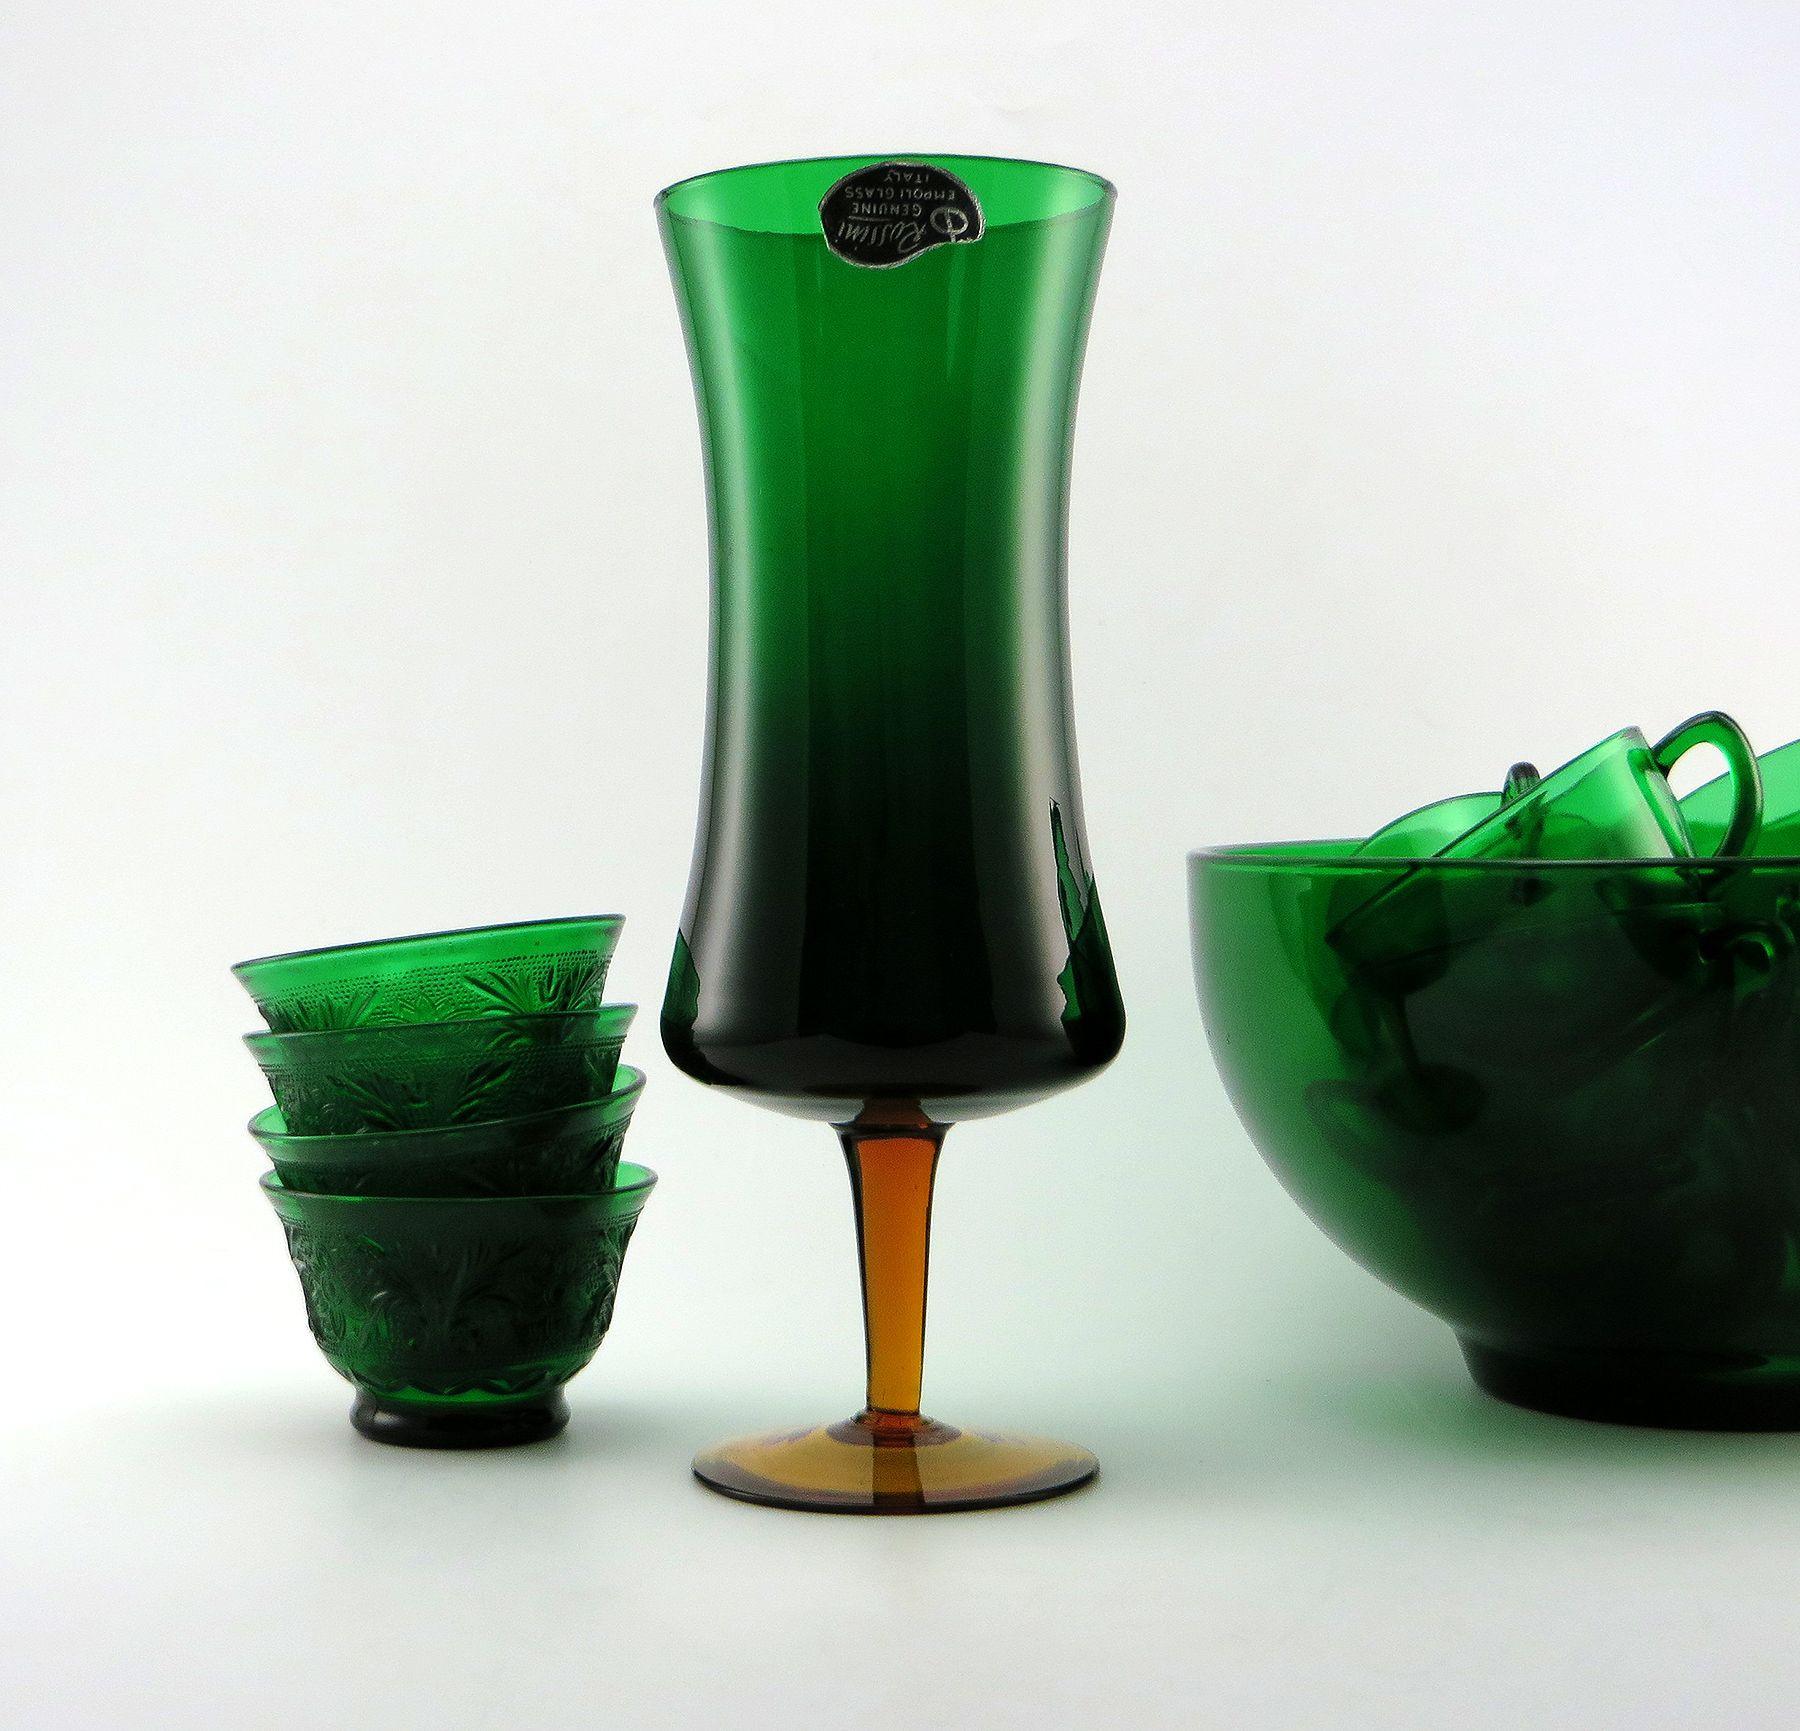 ceramic bud vase of green ceramic vase inspirational rossini empoli art glass retro inside green ceramic vase inspirational rossini empoli art glass retro modern vase with label retro art glass